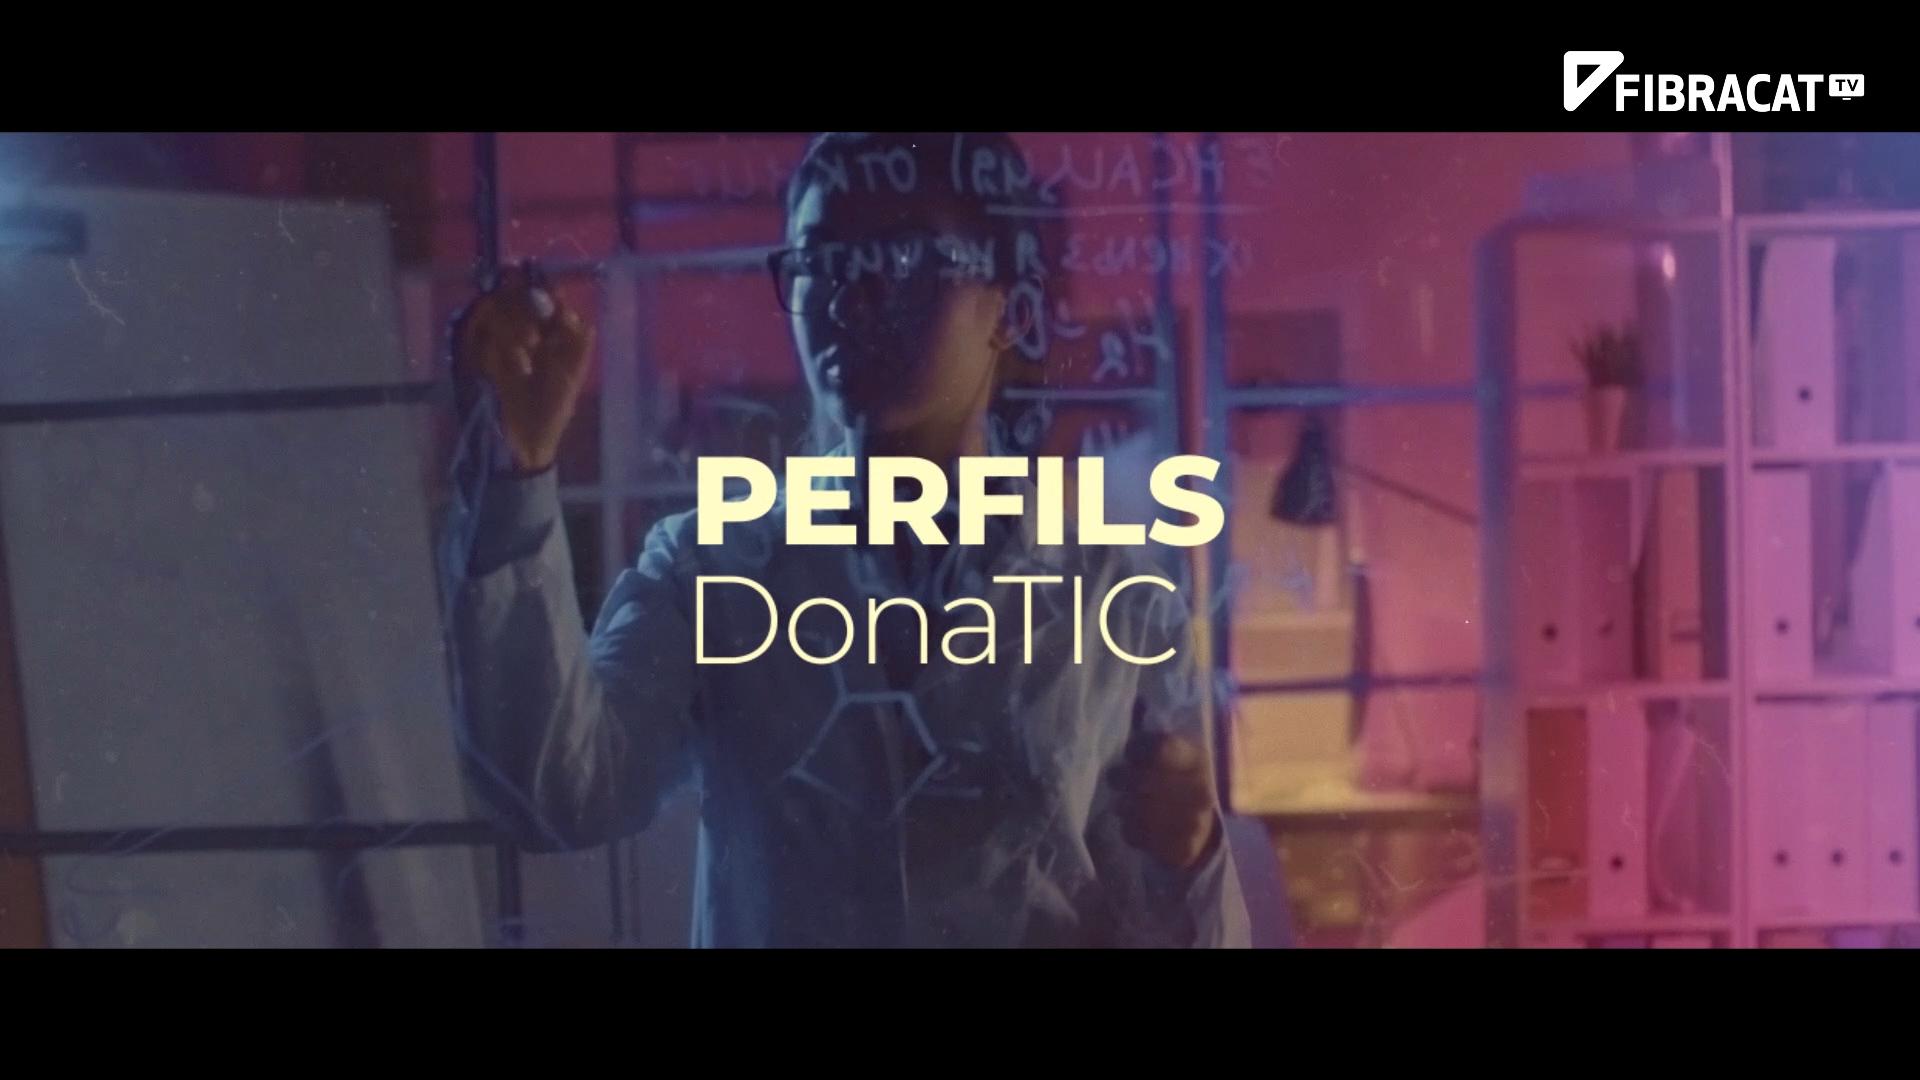 PerfilsDonaTic